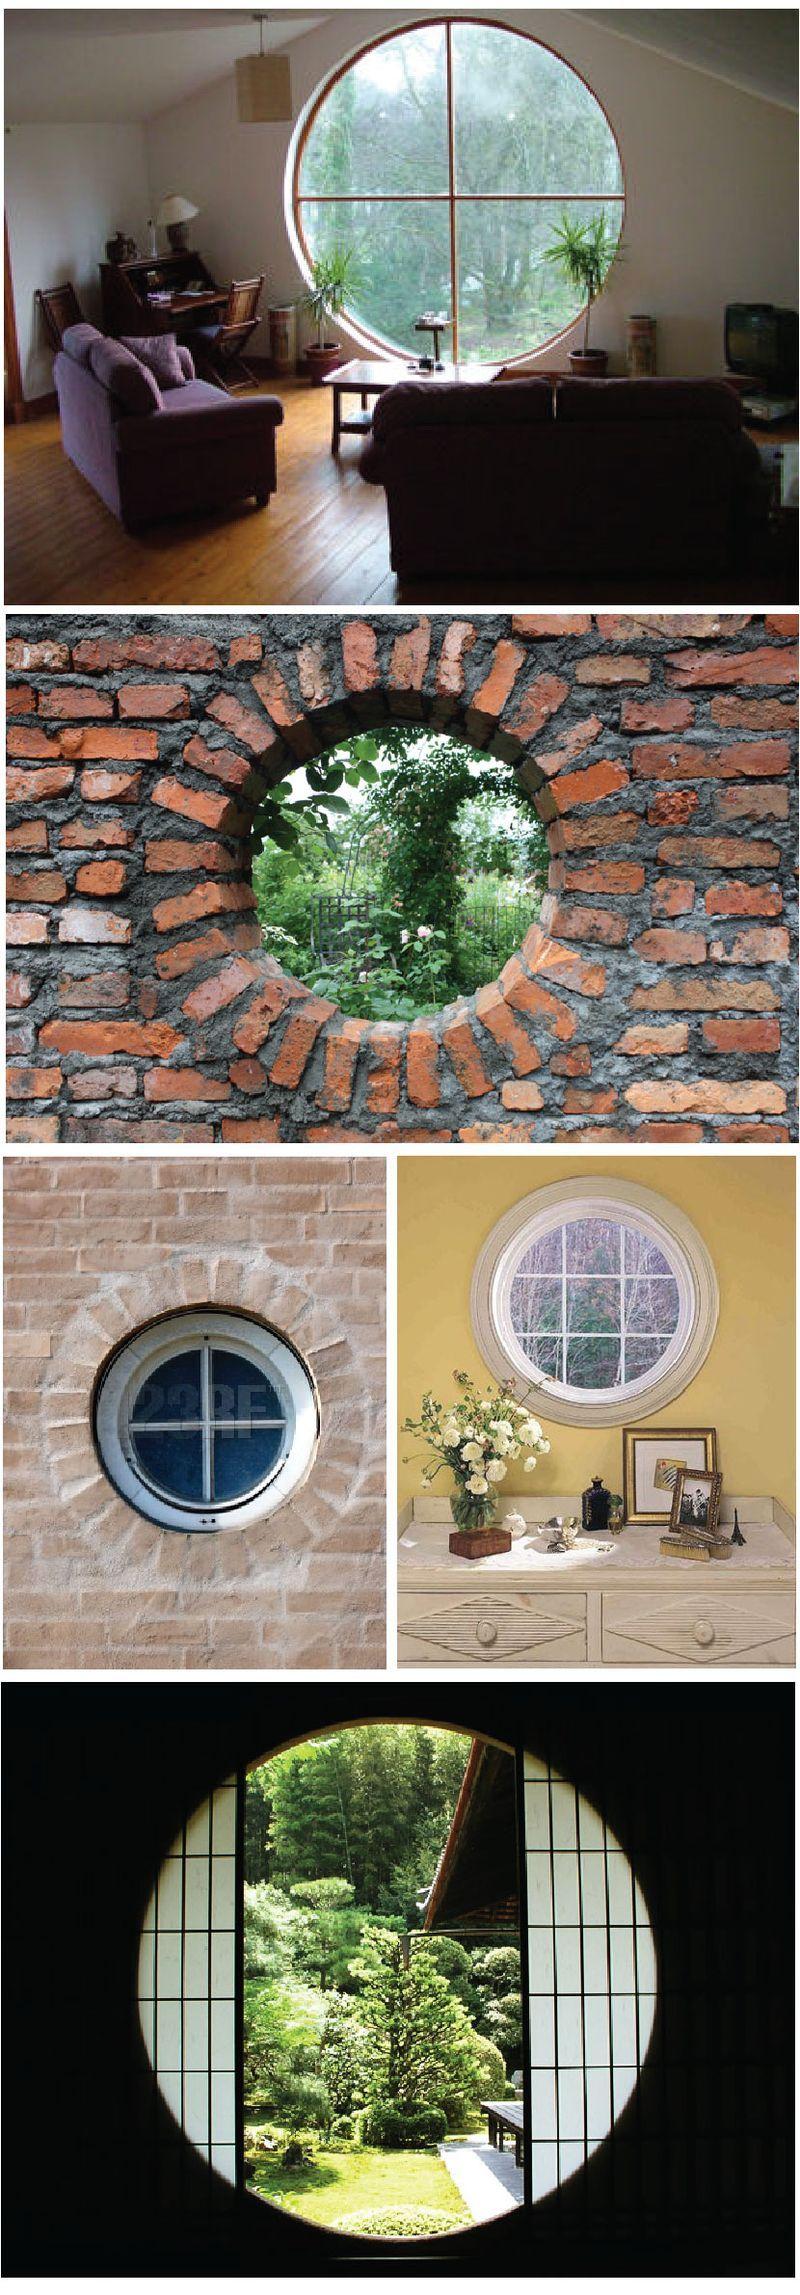 I love round windows | For the Home | Pinterest | Anbau, Wohnideen ...